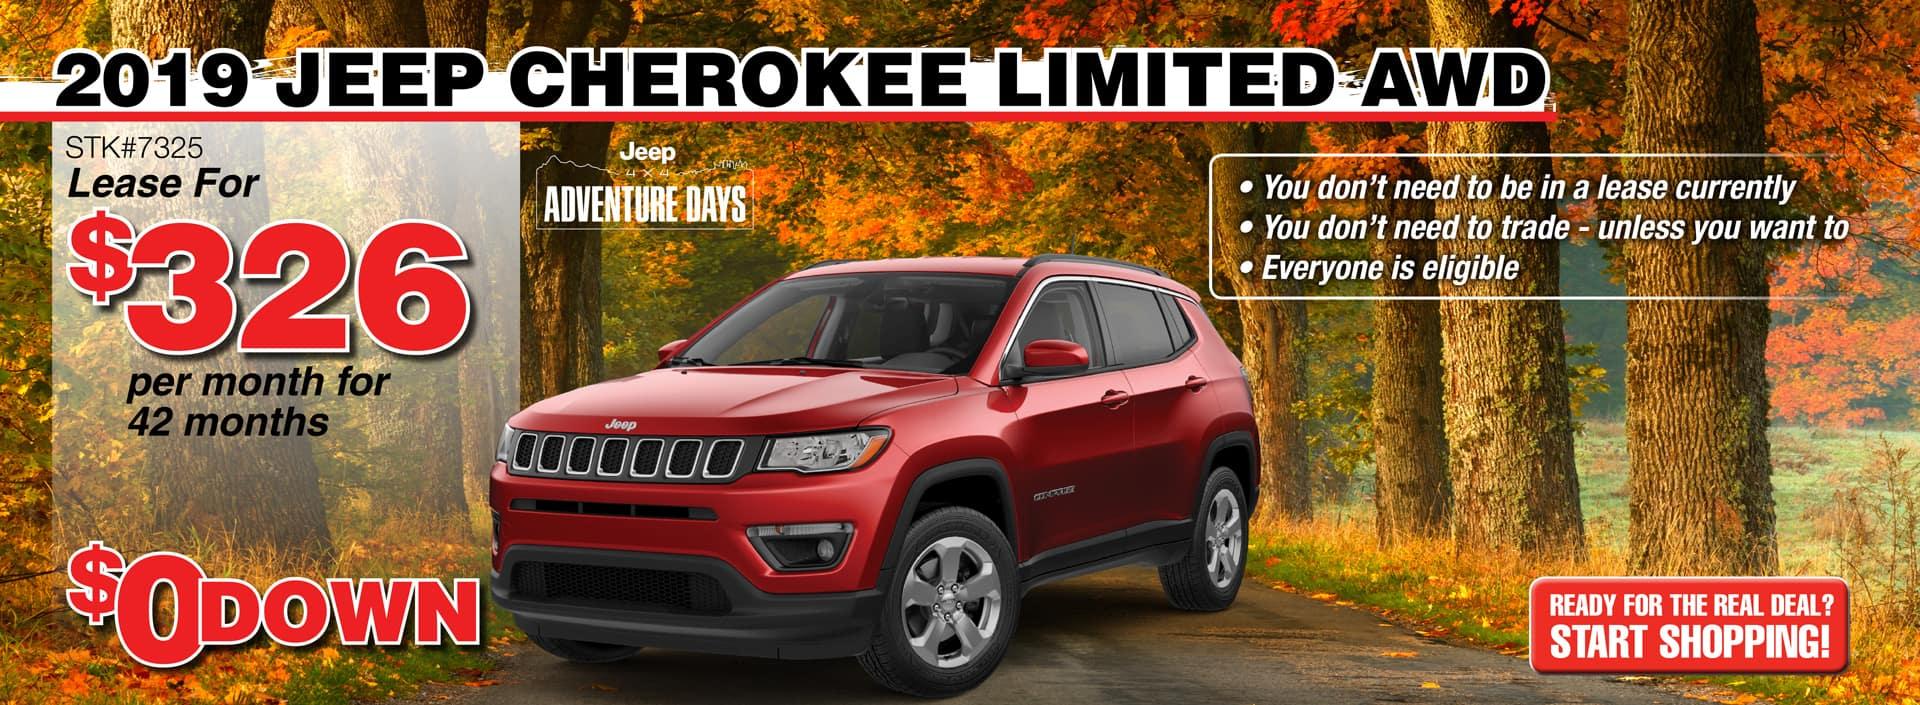 2019 Jeep Cherokee Limited AWD